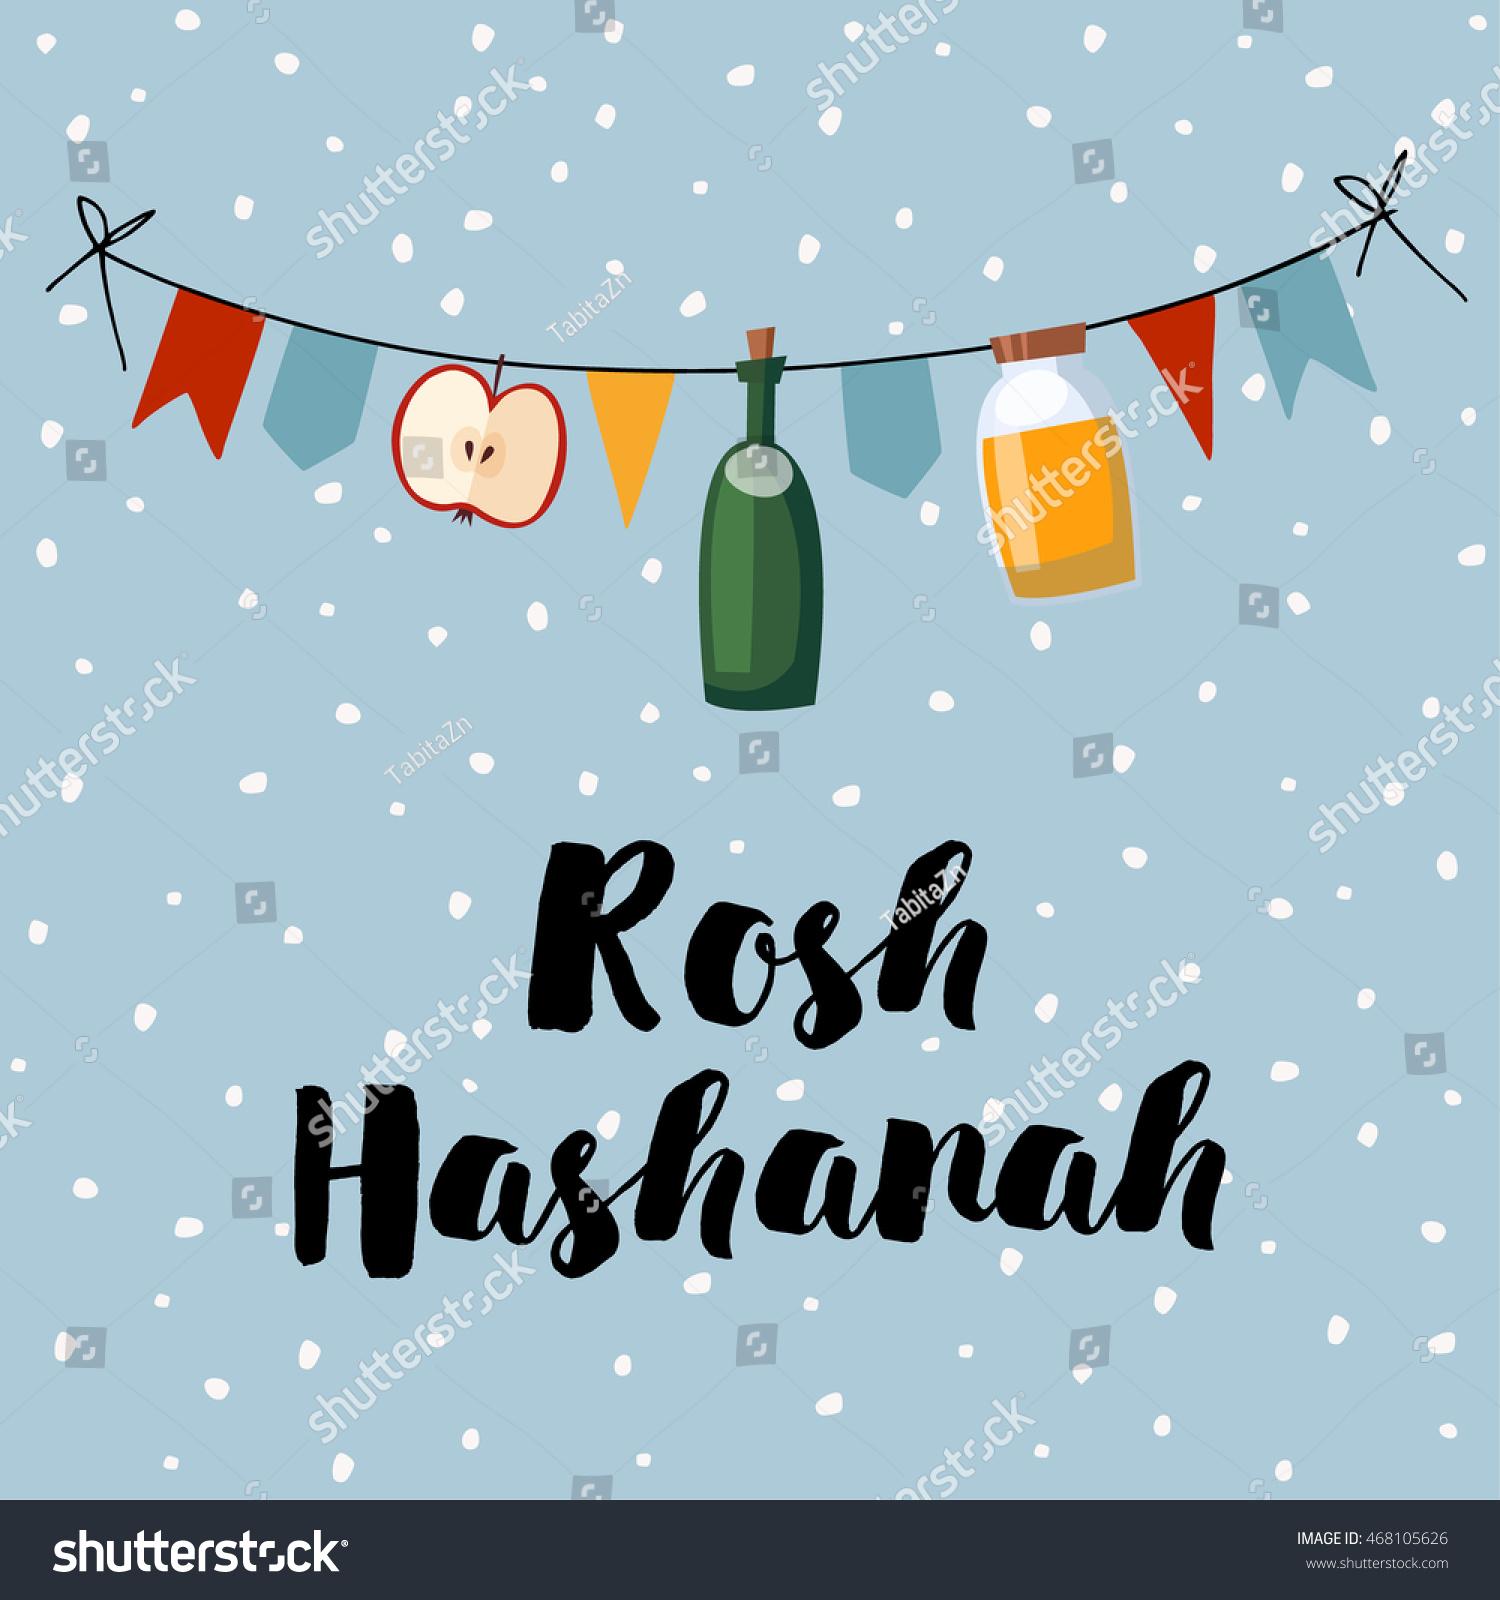 Rosh hashanah greeting card invitation banner stock vector rosh hashanah greeting card invitation banner decorative string with honey wine bottle kristyandbryce Choice Image